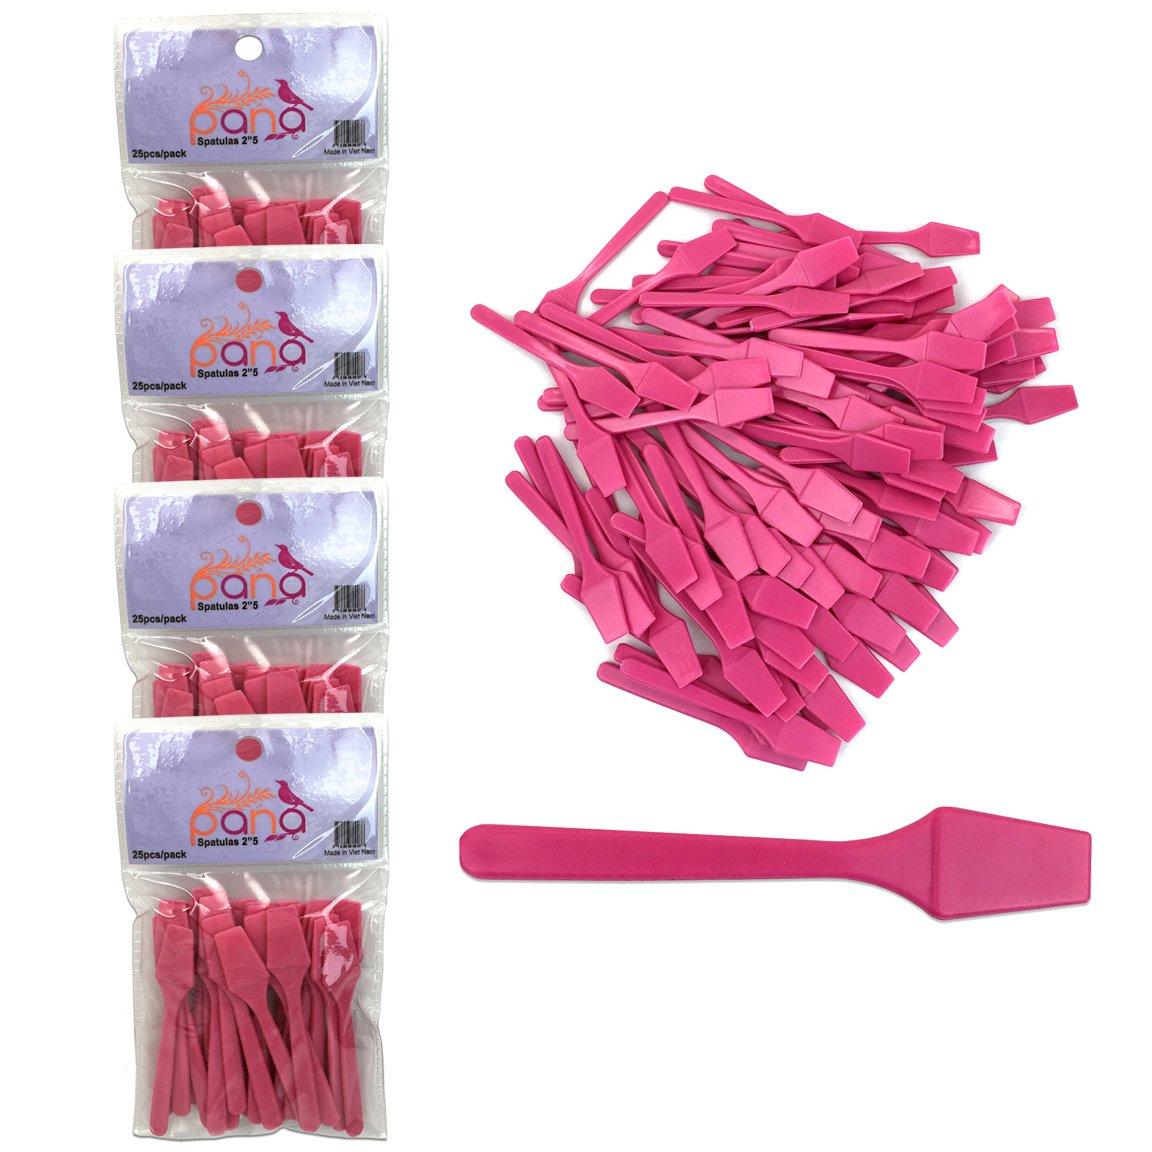 "Beauticom Pana Brand (Pink Color) (4 Packs of 25pcs = 100 Pieces) Cosmetic Make Up Disposable Plastic 2.5"" Spatulas Skin Care Facial Cream Mask Spatula"